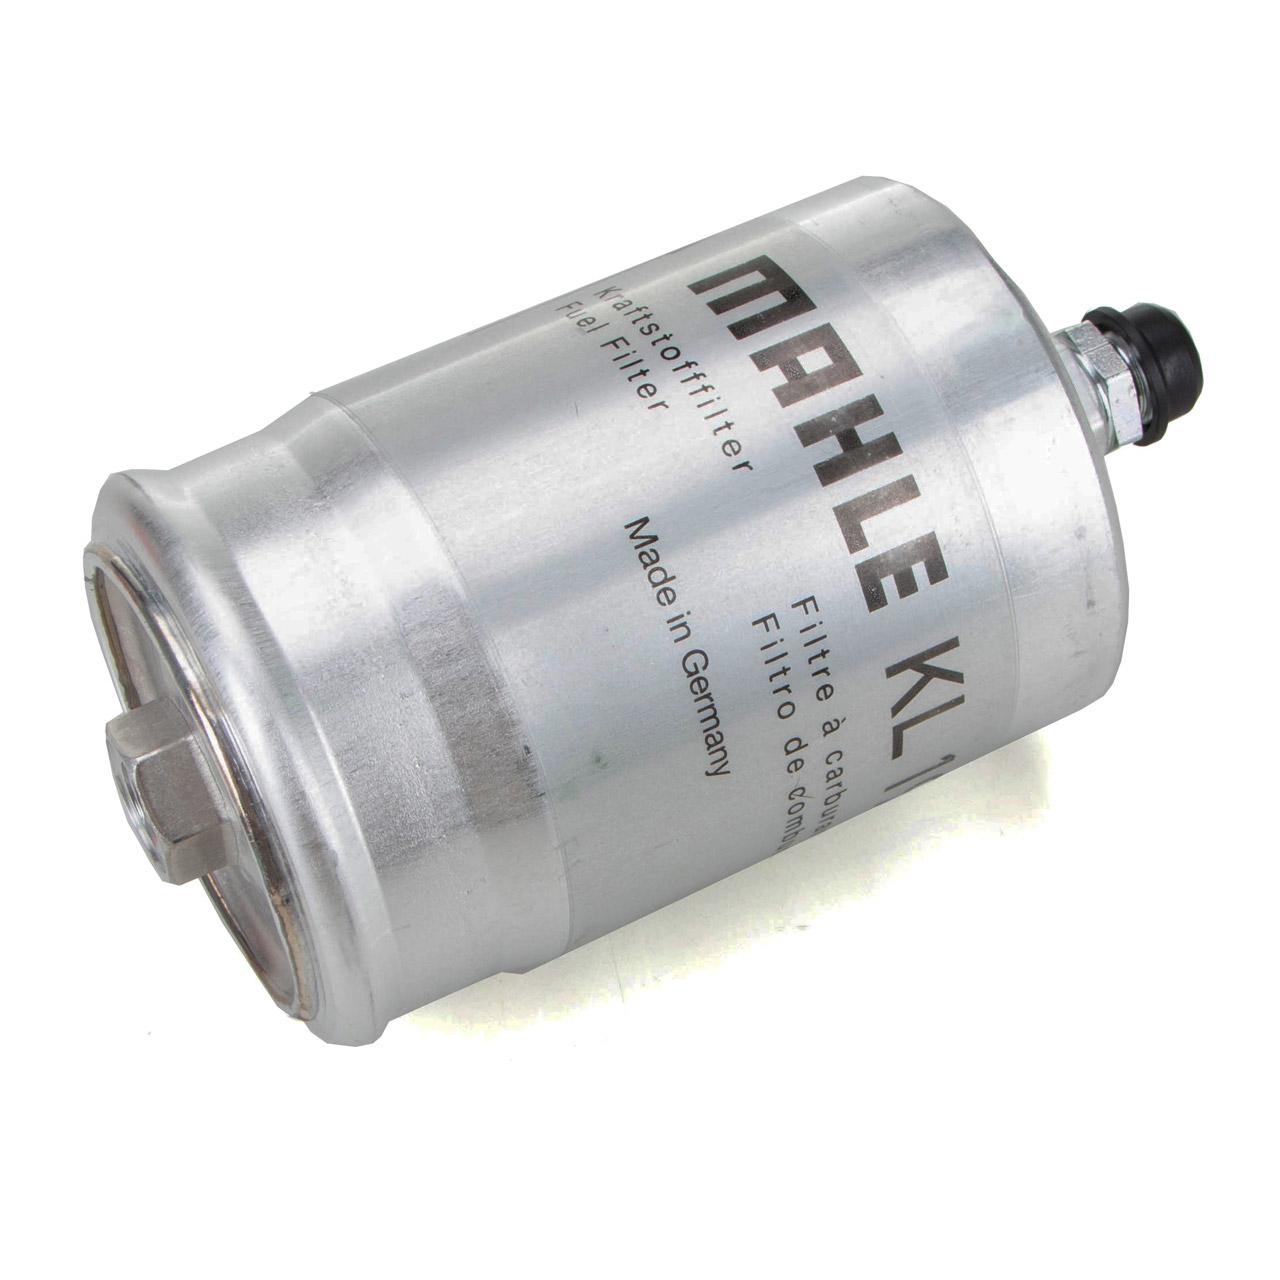 MAHLE KL19 Kraftstofffilter Benzin PORSCHE 911 3.0 Turbo 260 PS 1975-1977 93011013900